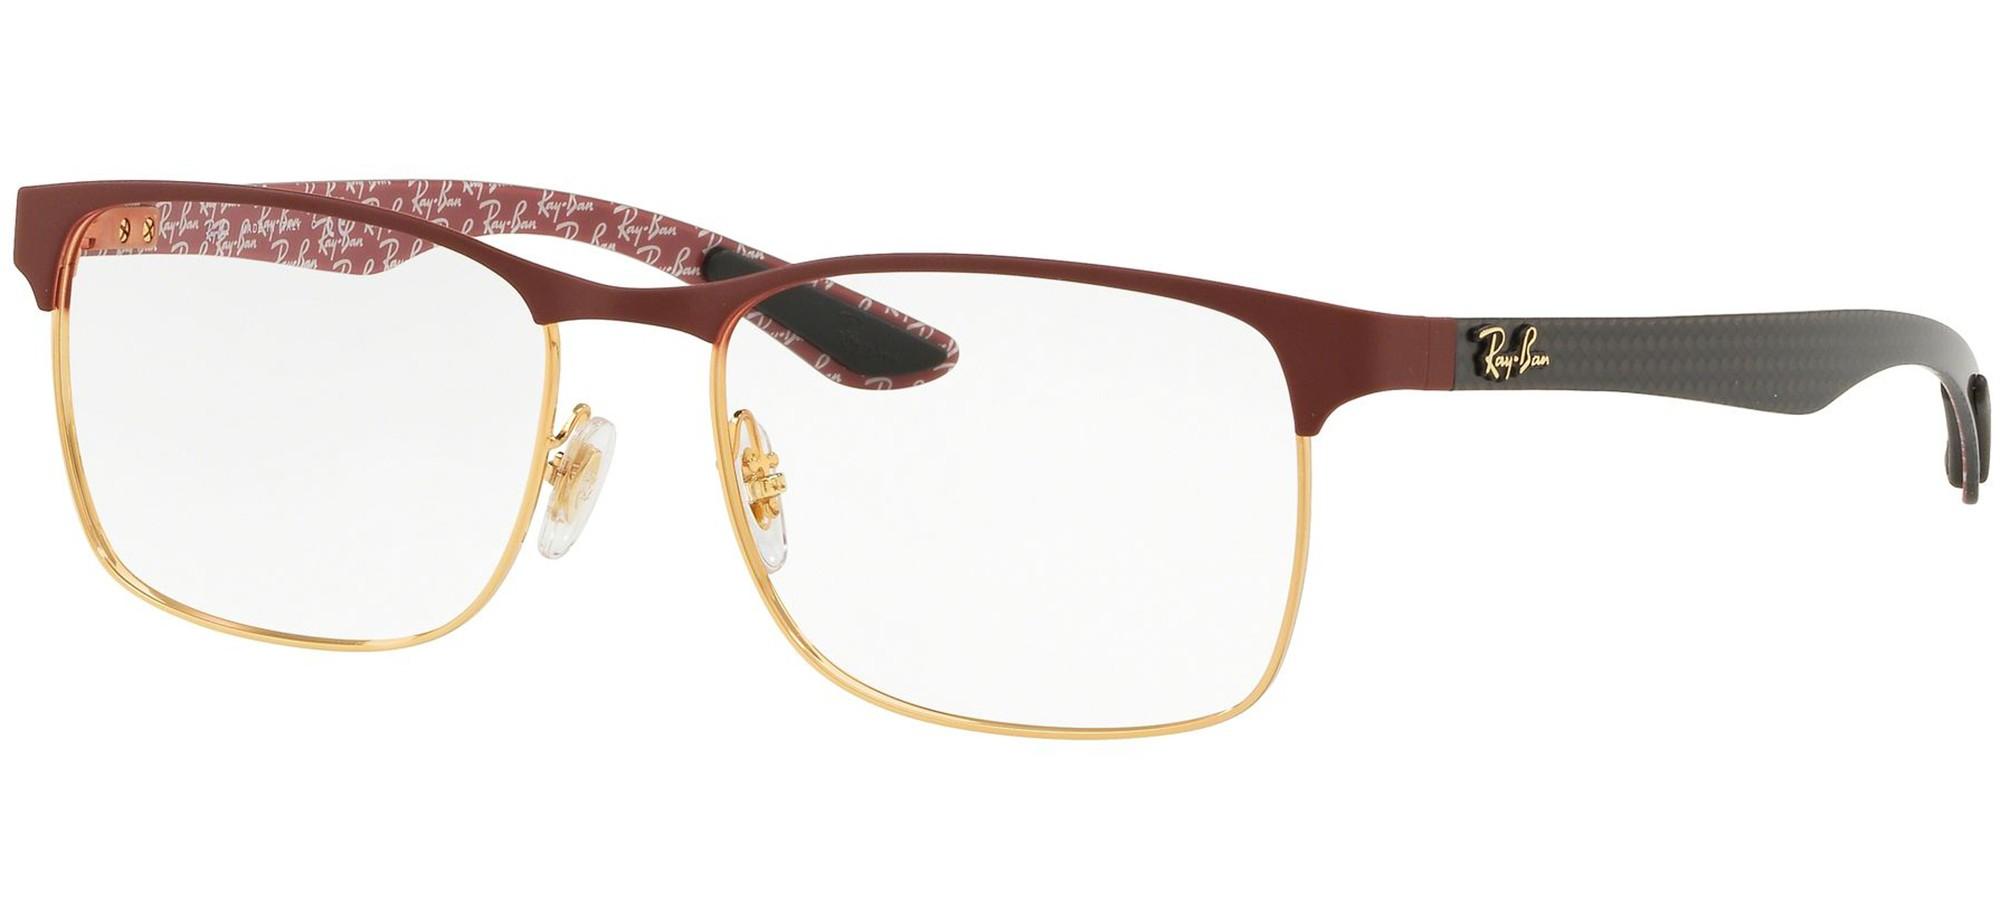 Ray-Ban eyeglasses RX 8416